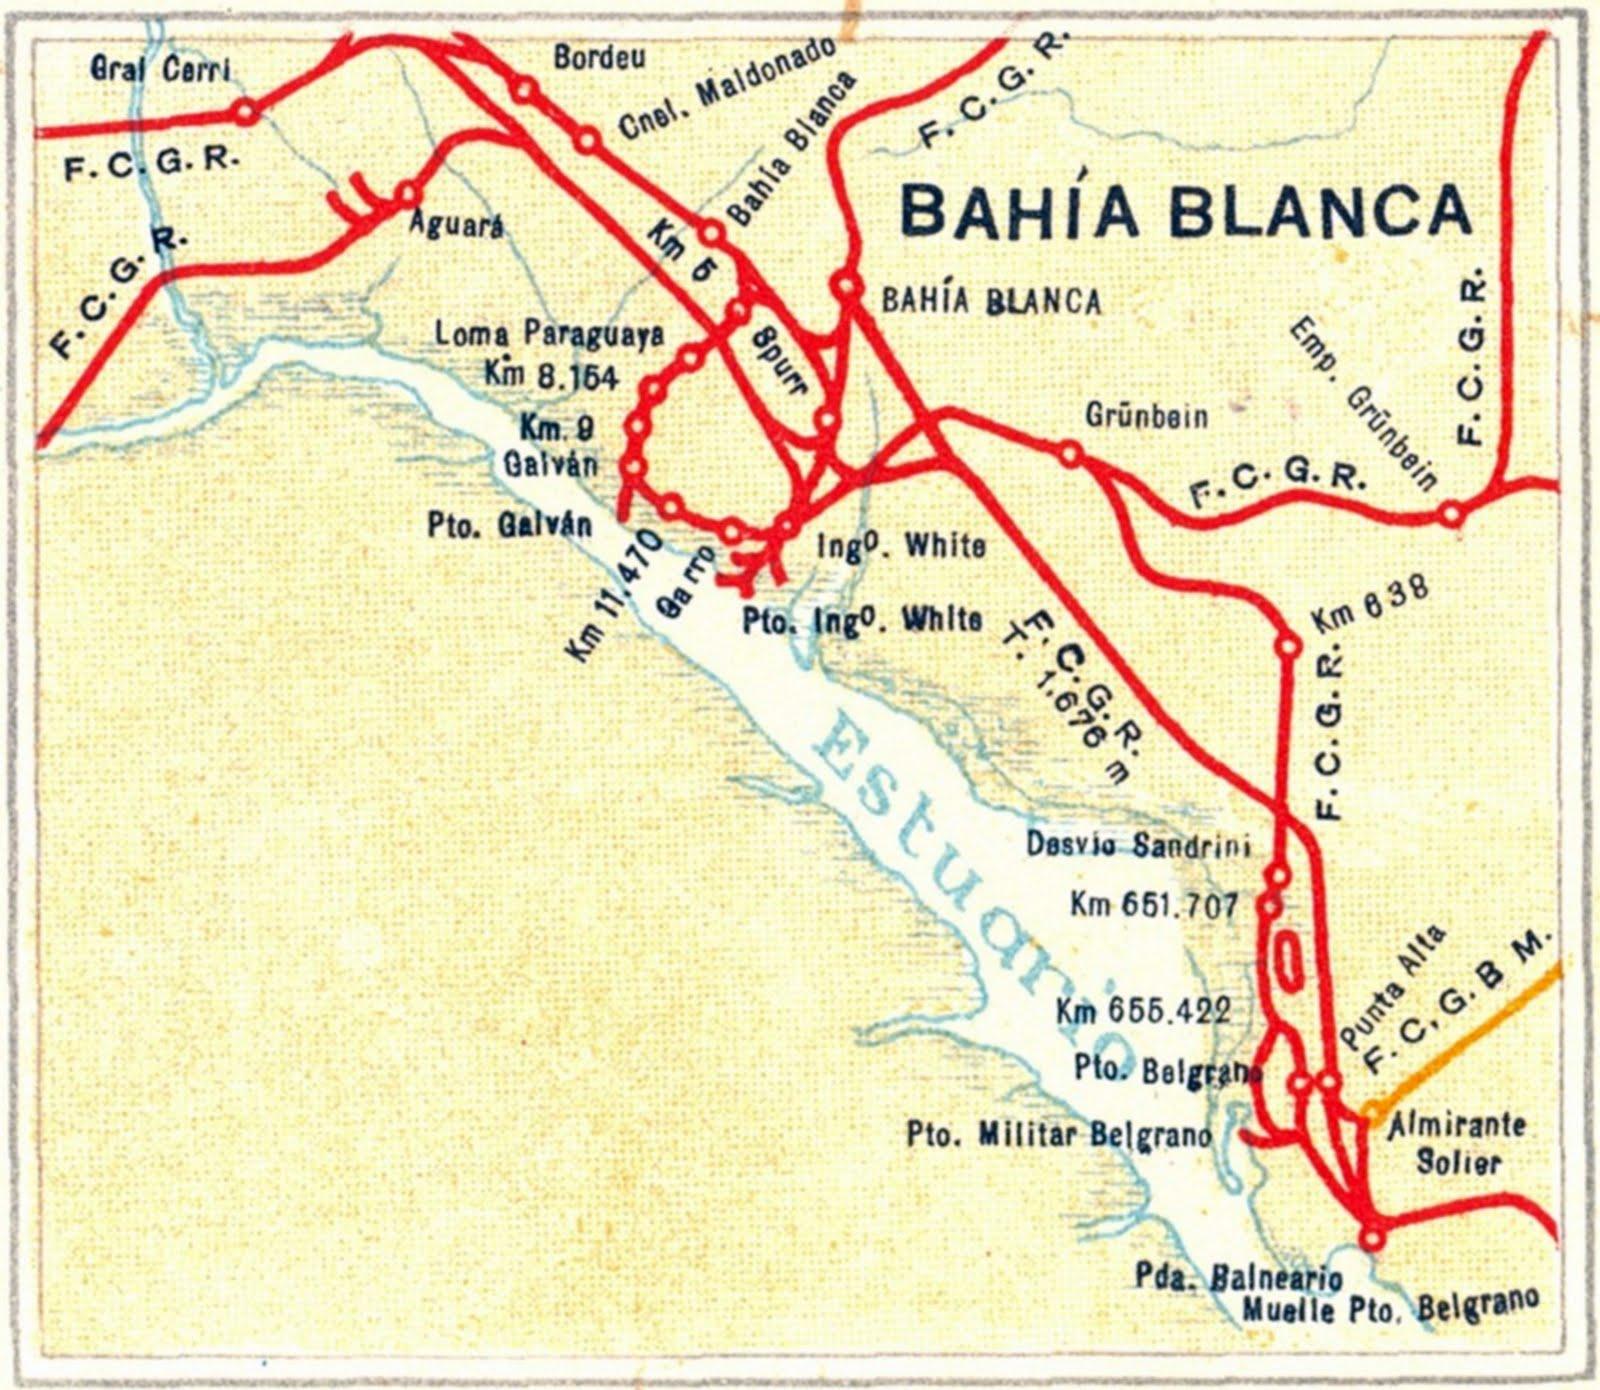 Mapa bahia blanca